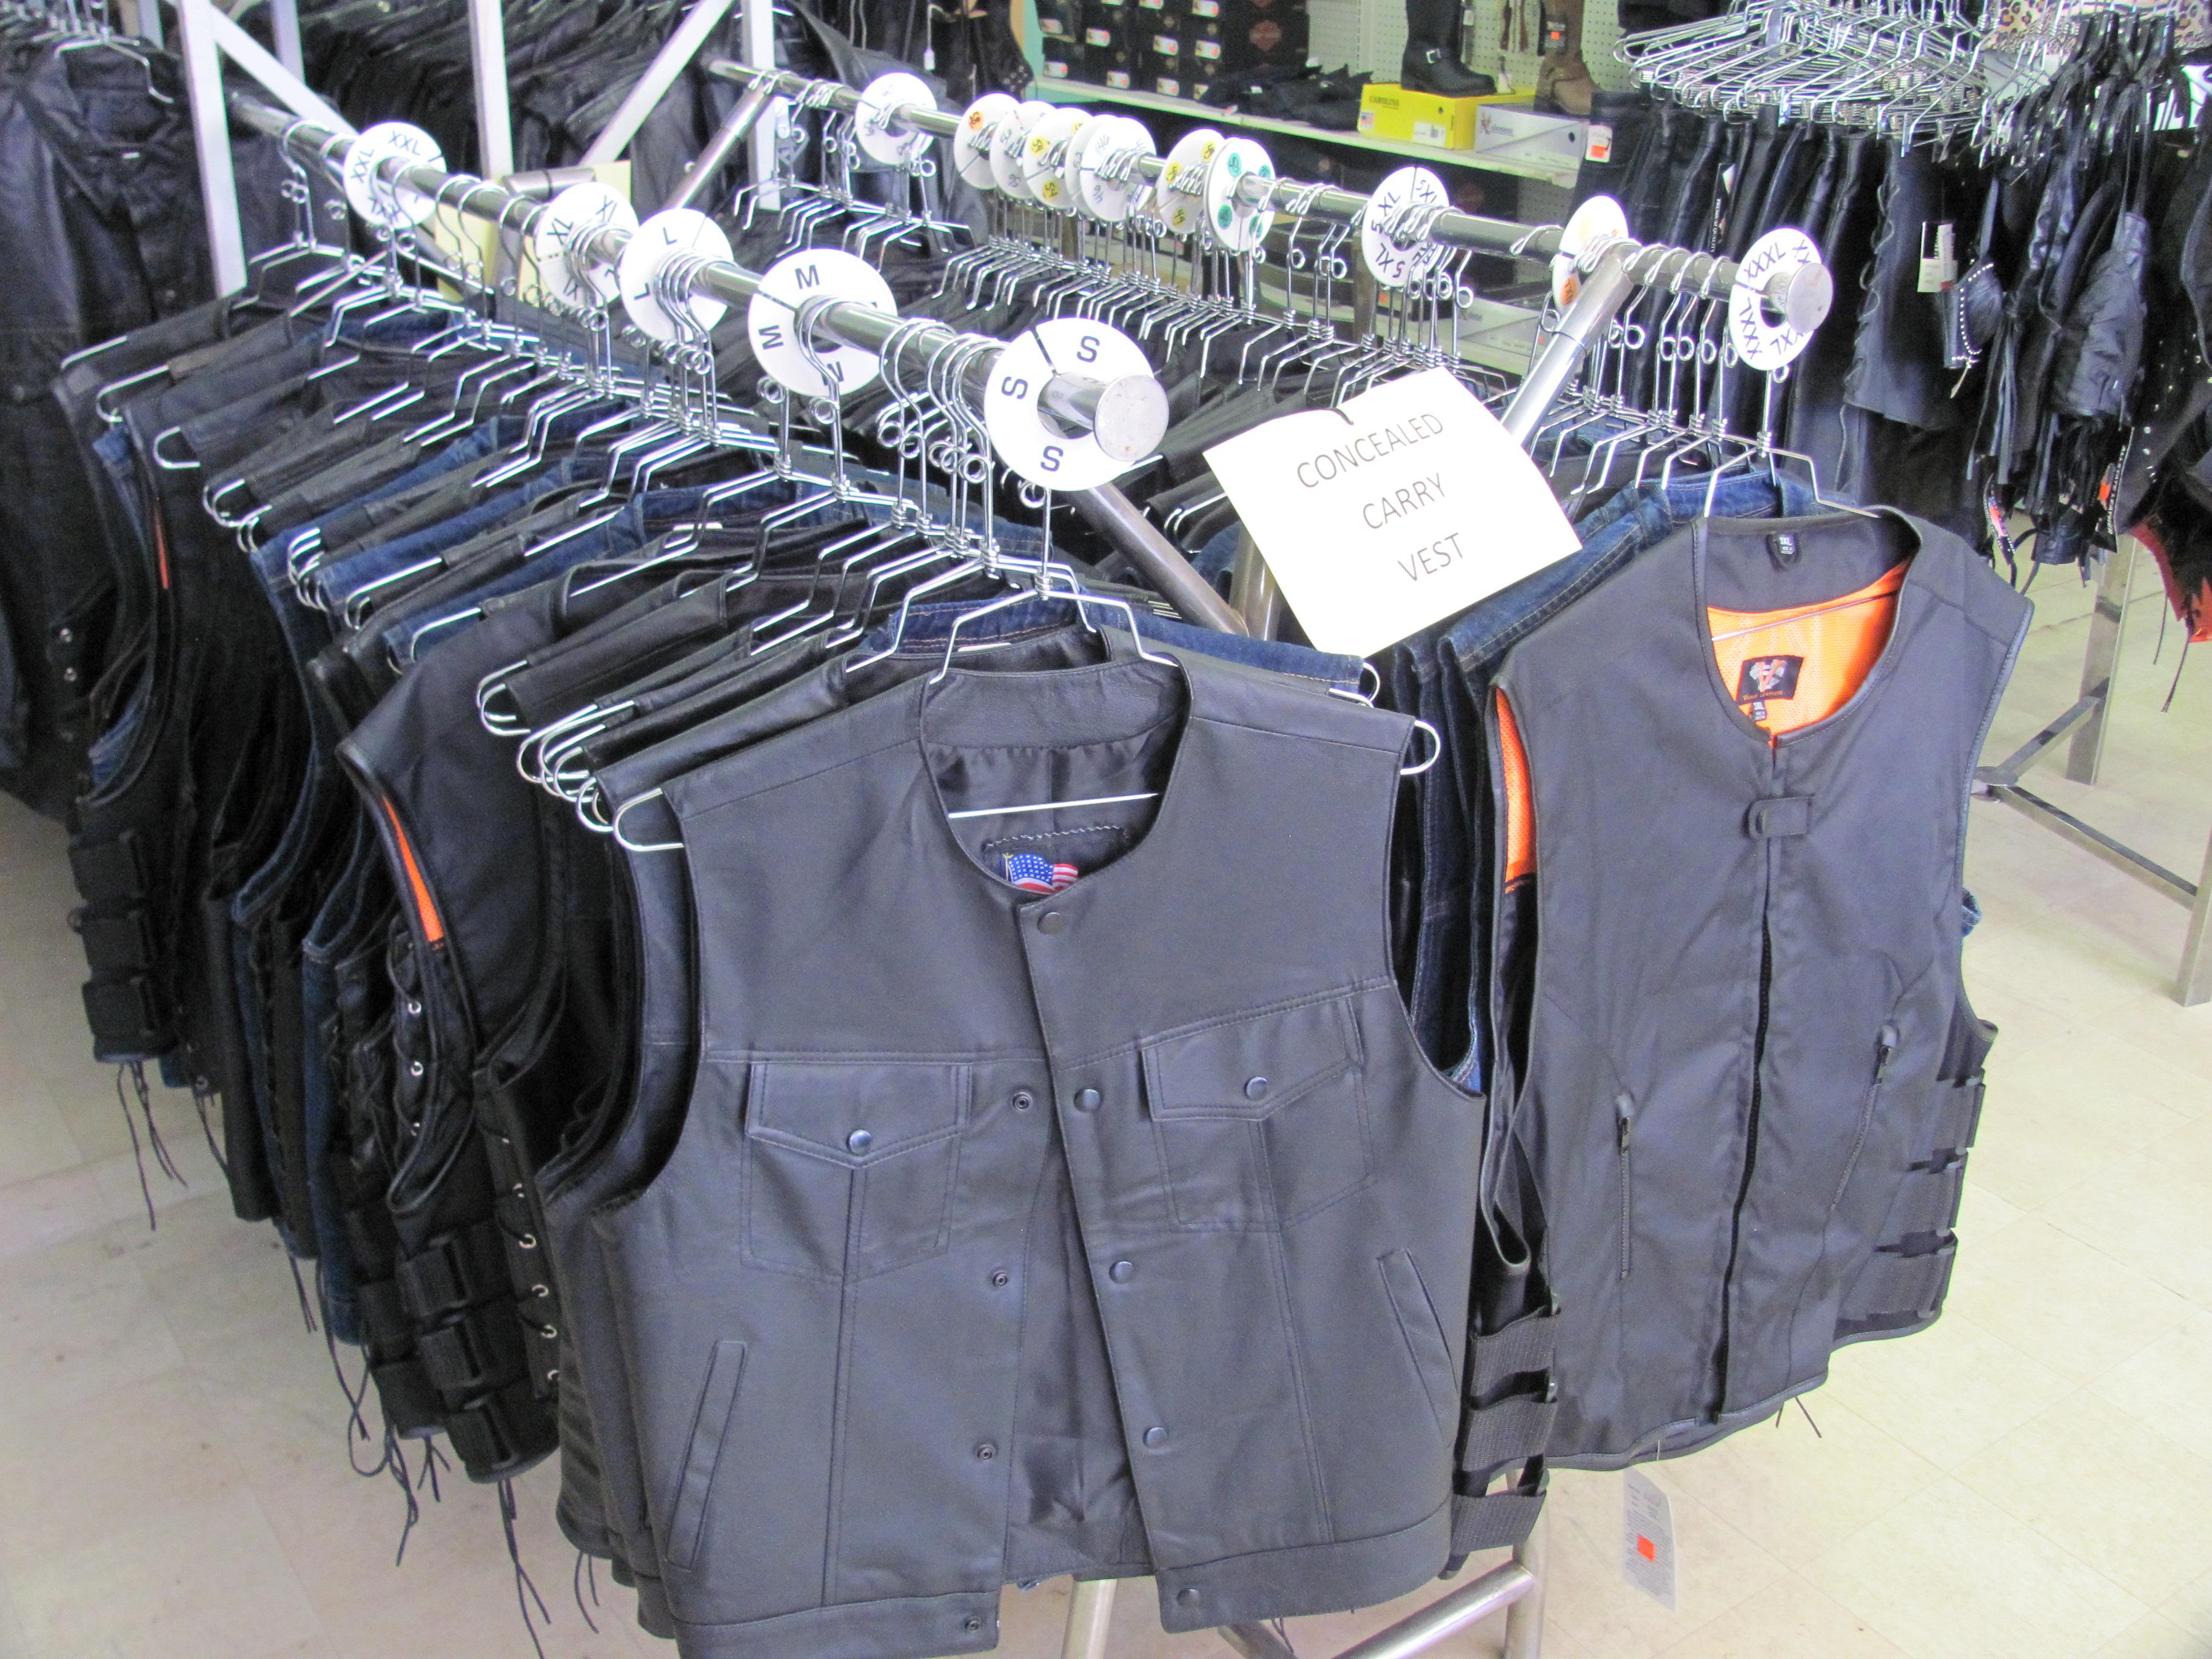 store photos 6-14 018